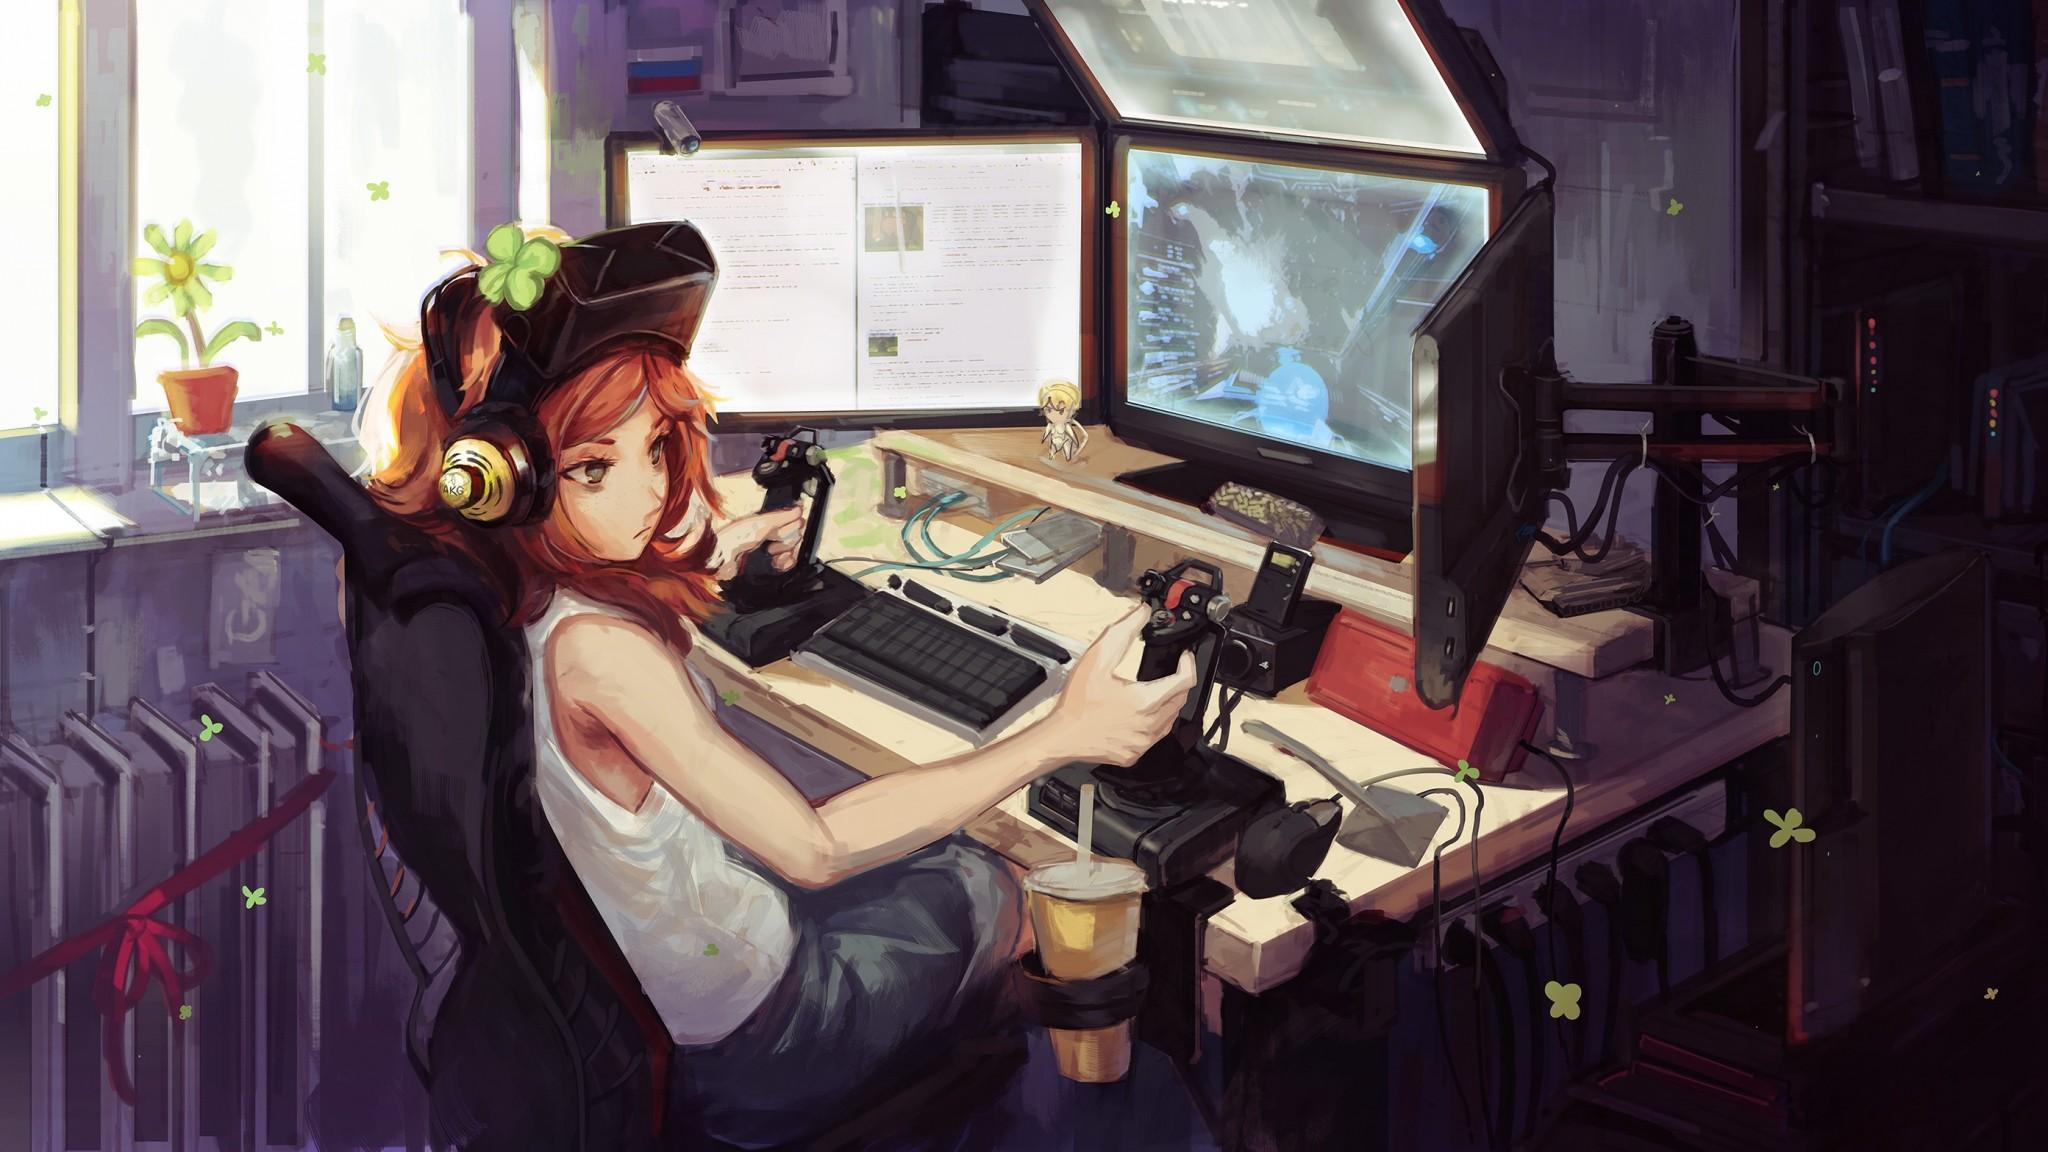 Wallpaper vivian james, computer, game, monitors, gamer